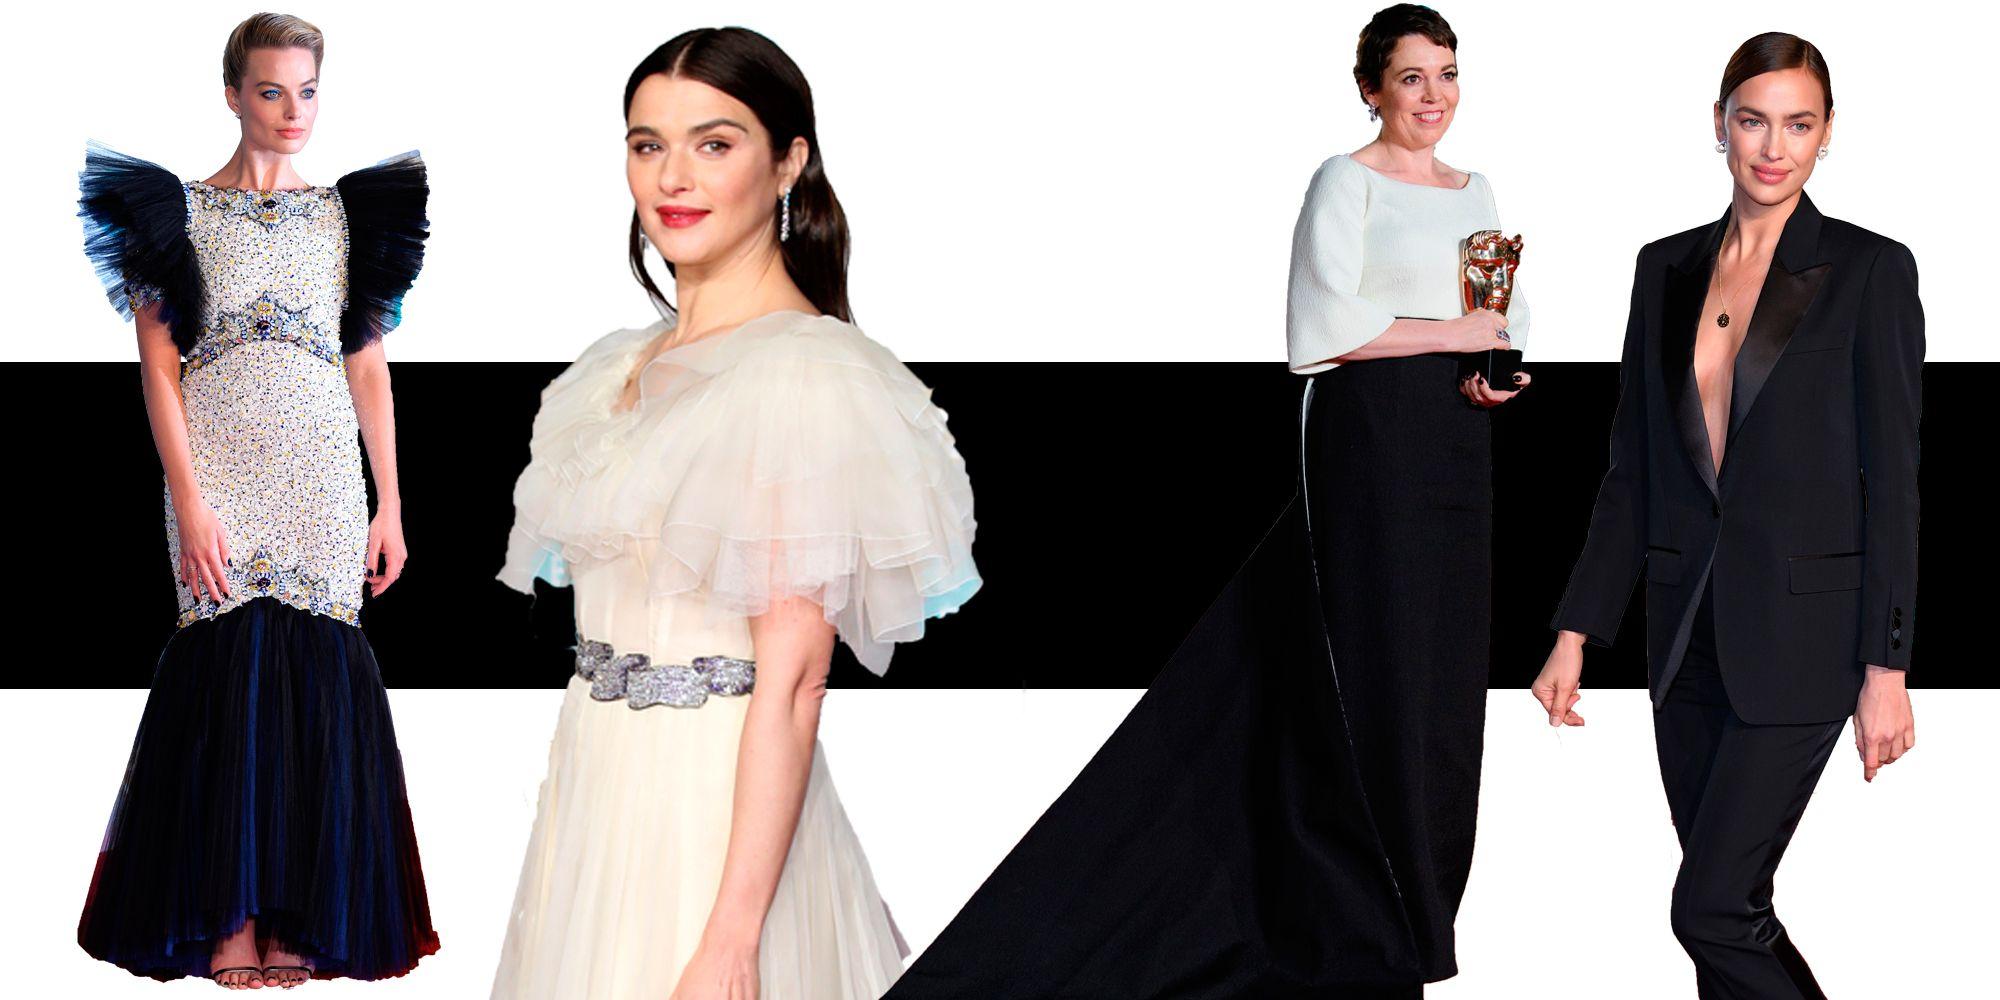 Baftas 2019: Best Dresses At The BAFTAs 2019